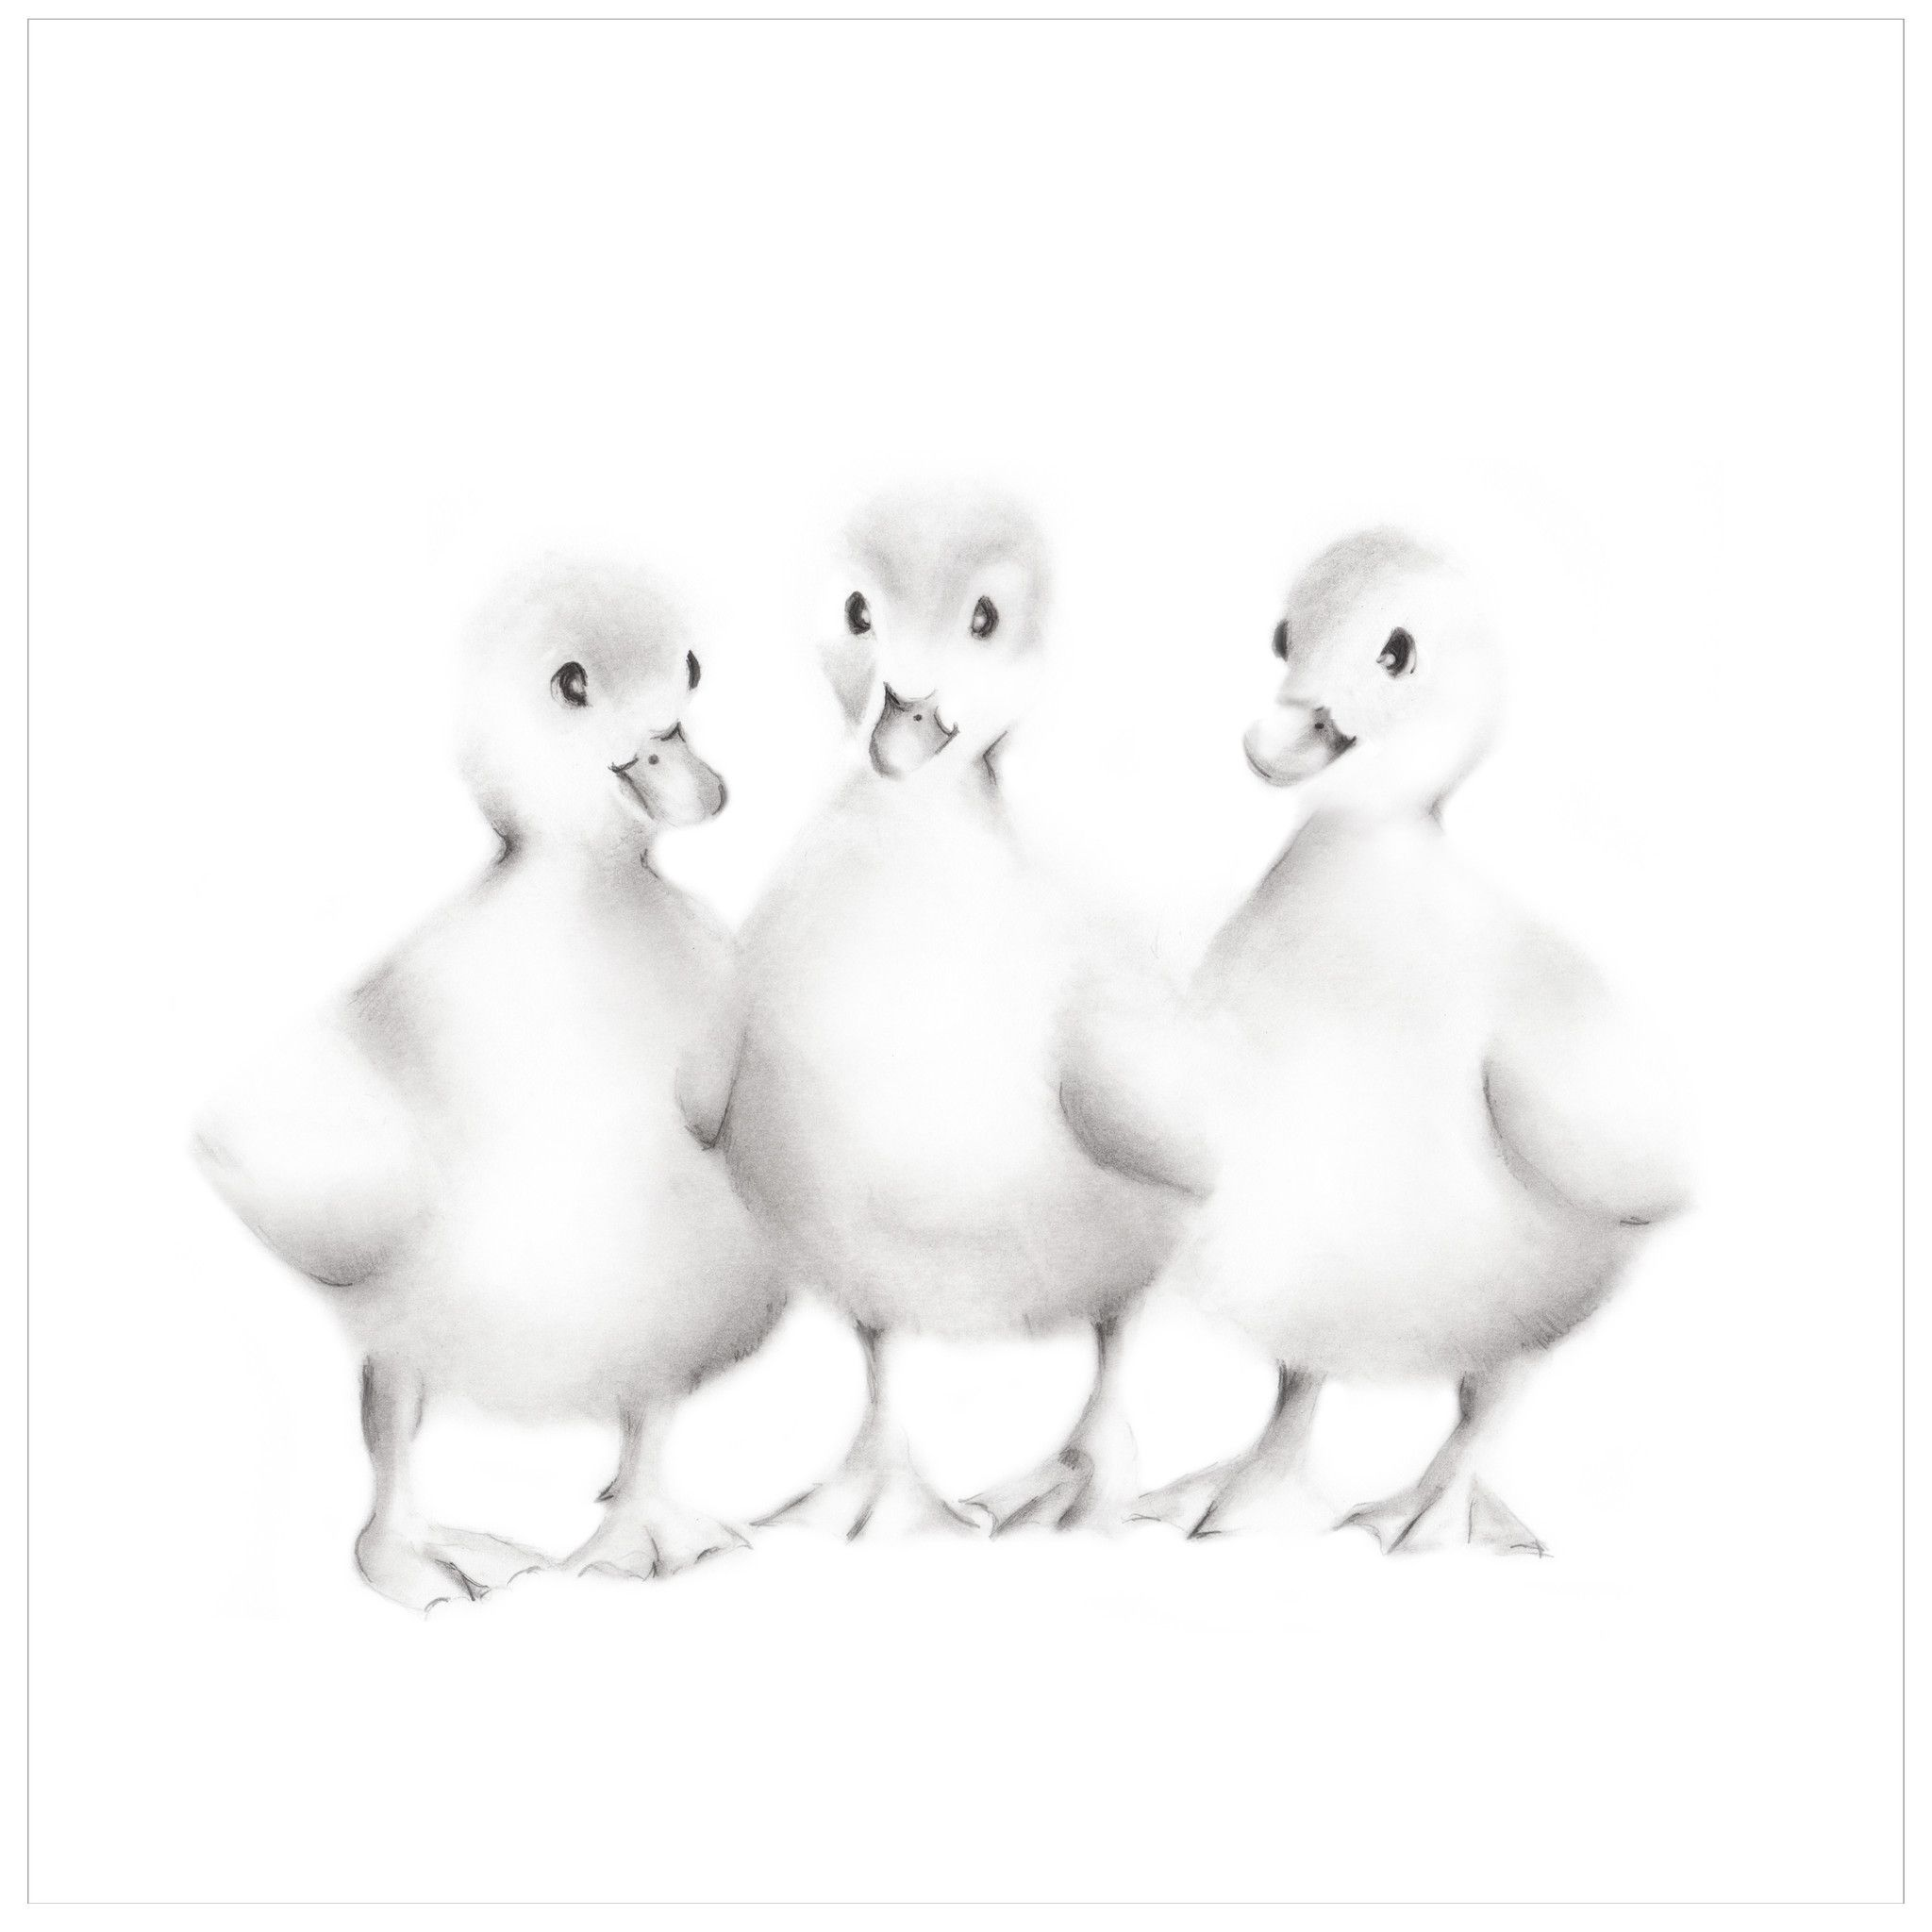 Baby Duckling Pencil Drawing Print